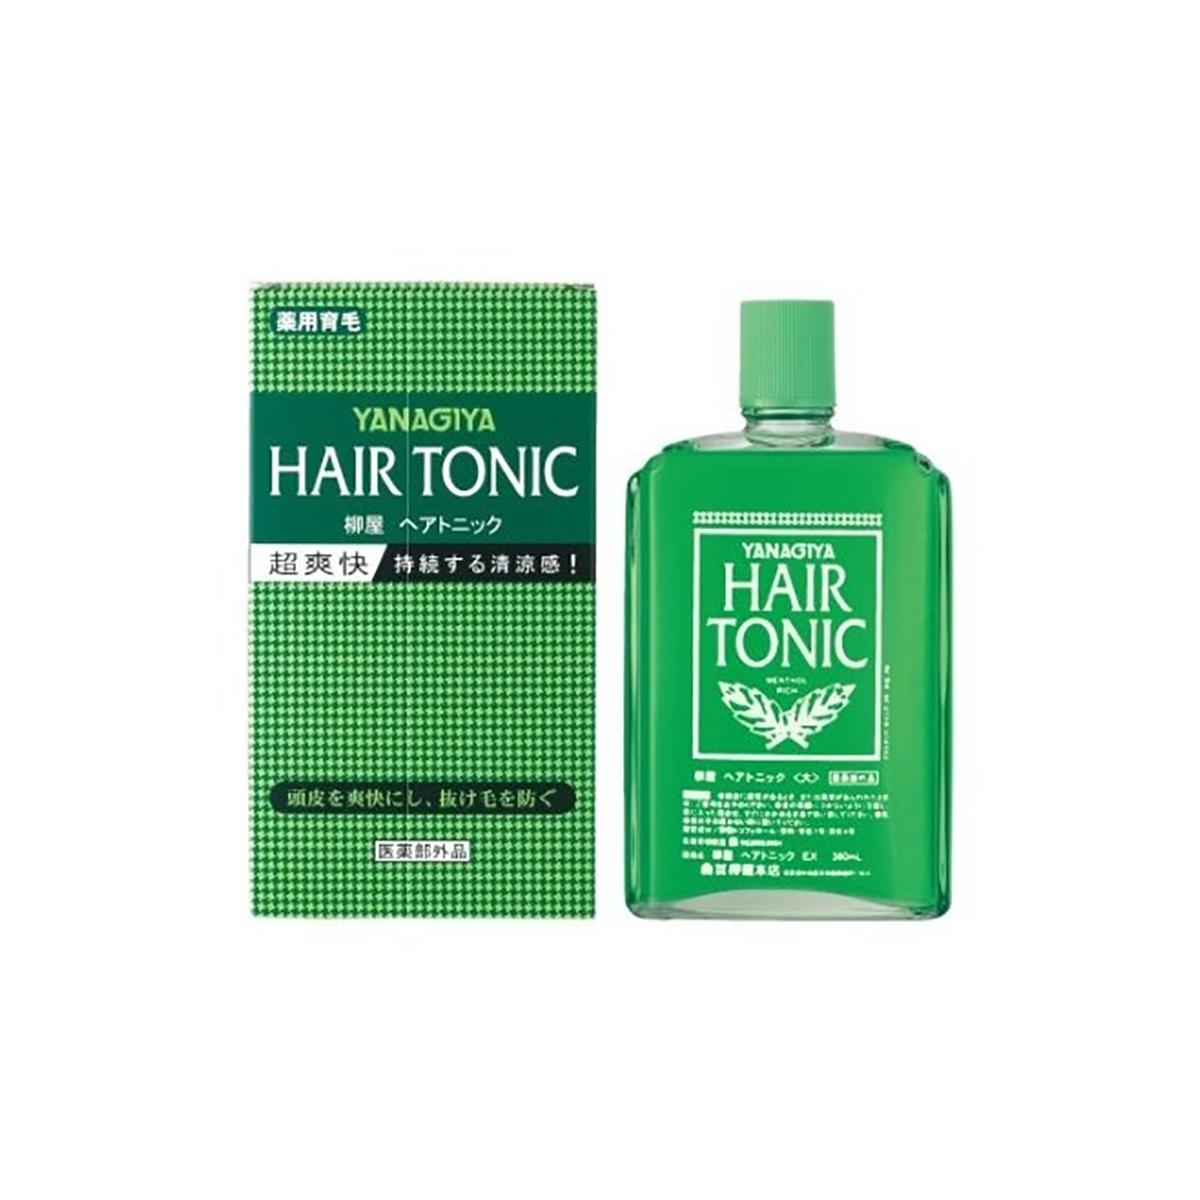 Buy YANAGIYA Hair Tonic (Large) (360ml) [Ship from SG / 100% Authentic] Singapore